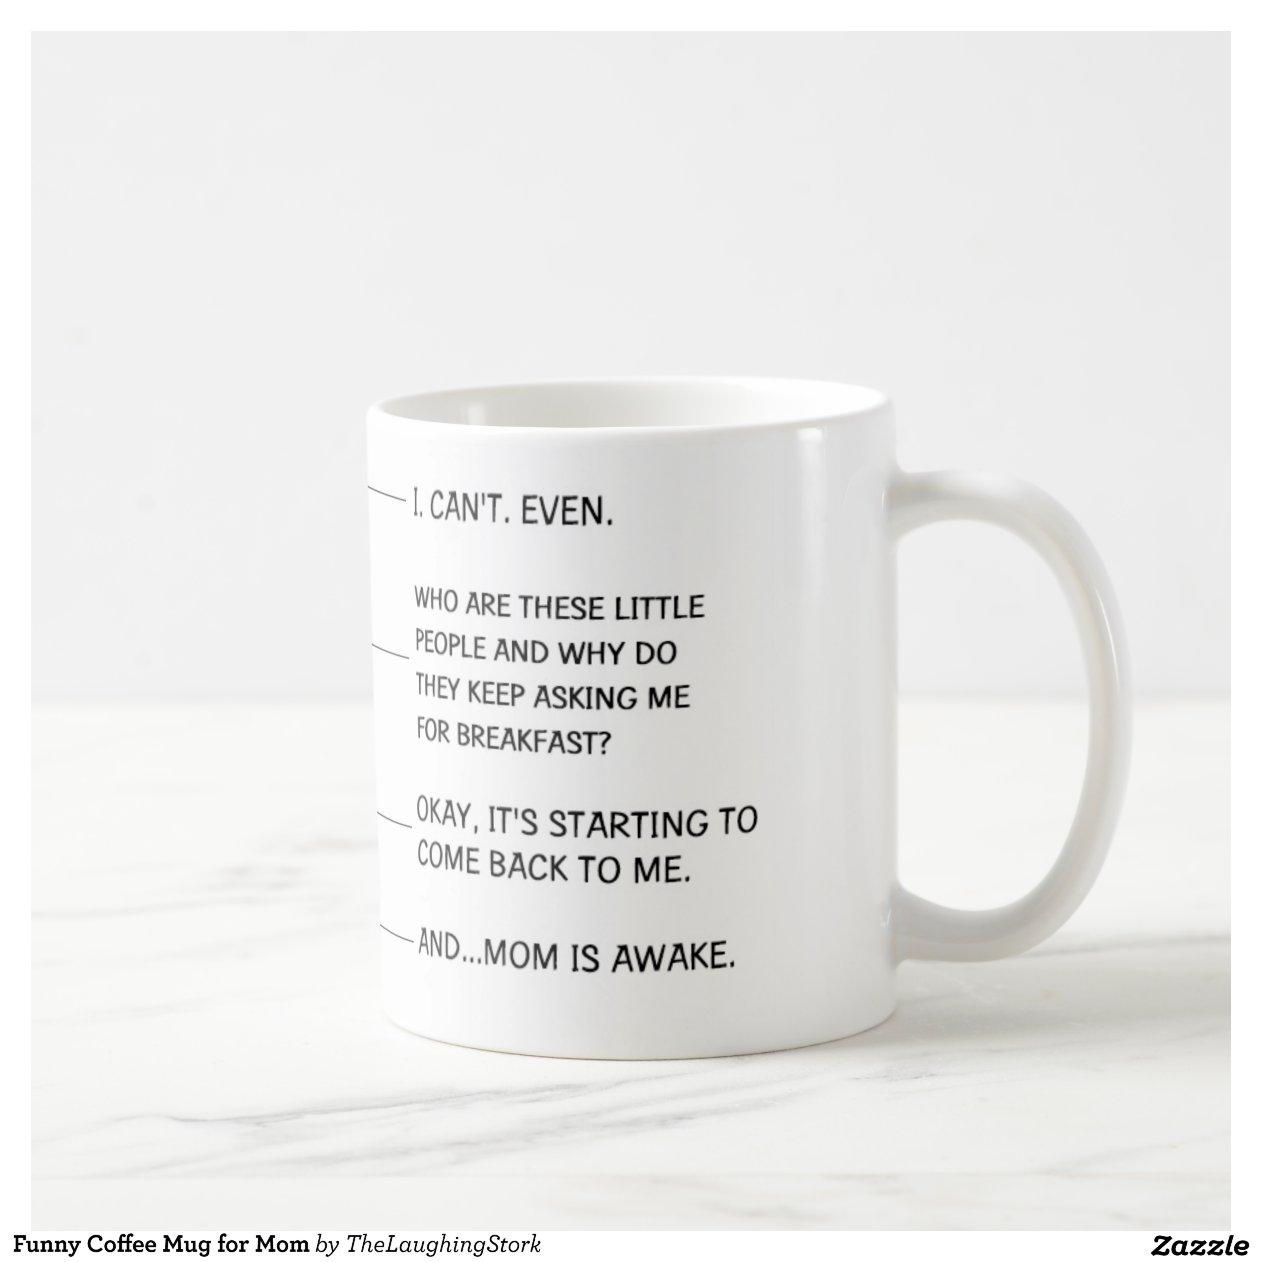 Funny Coffee Mug For Mom Re6fa125a774a40b59d72e4fdedd7f850 X7jgr 8byvr